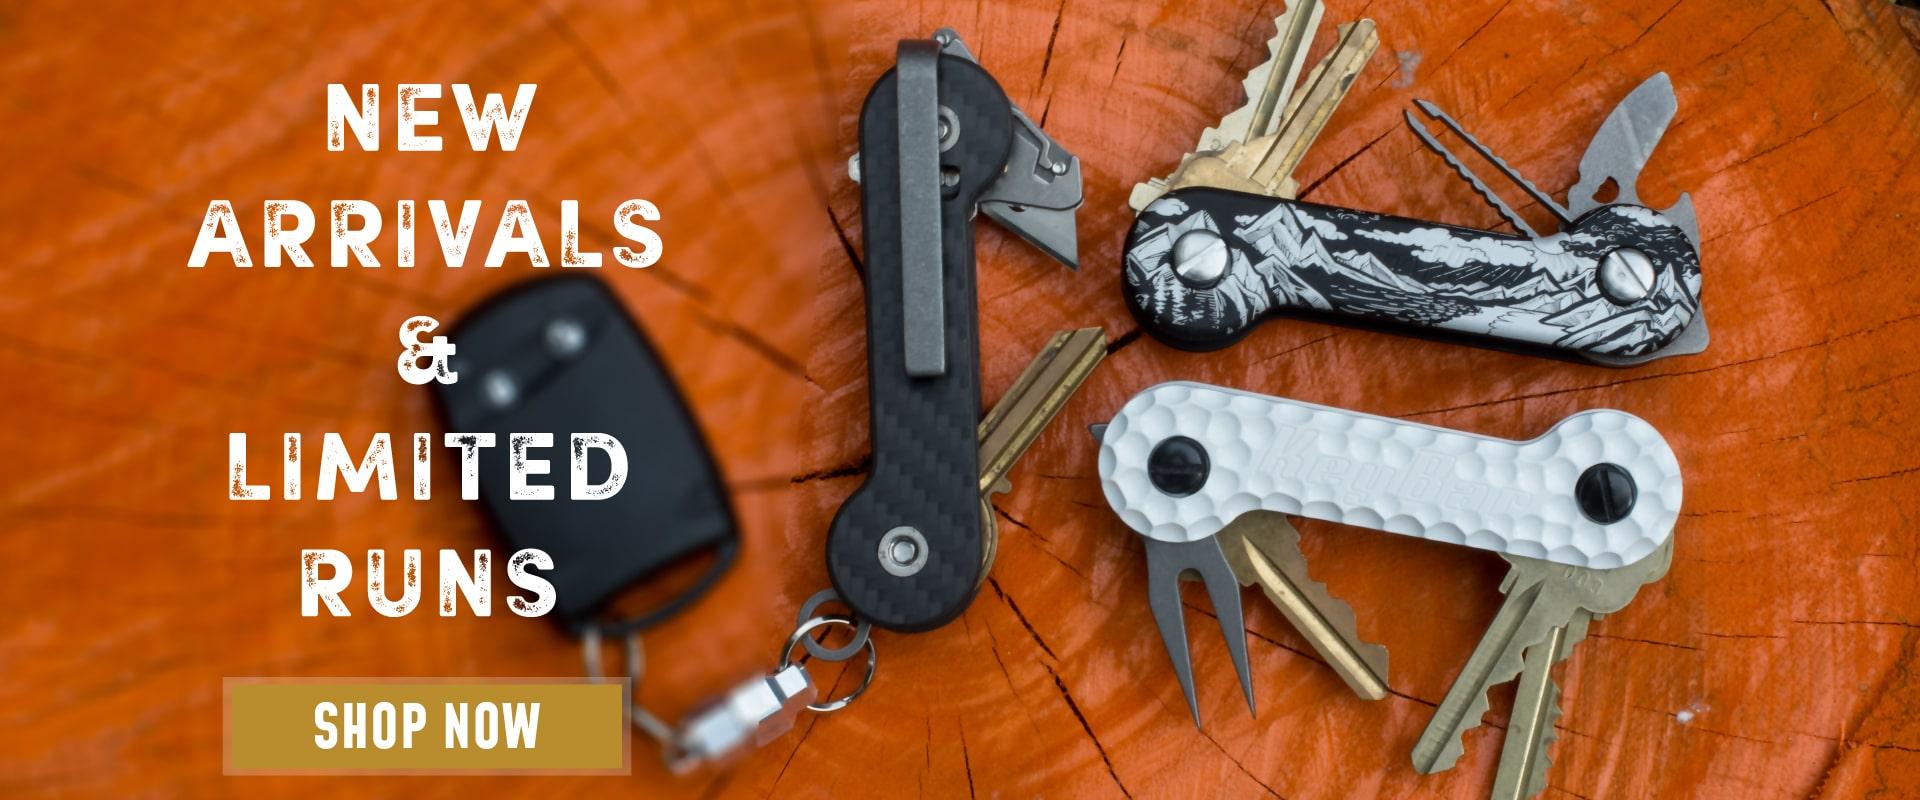 KeyBar-Key Organizer-Homepage-Desktop-Image-Orange Background-New Arrivals-Limited Runs Desktop